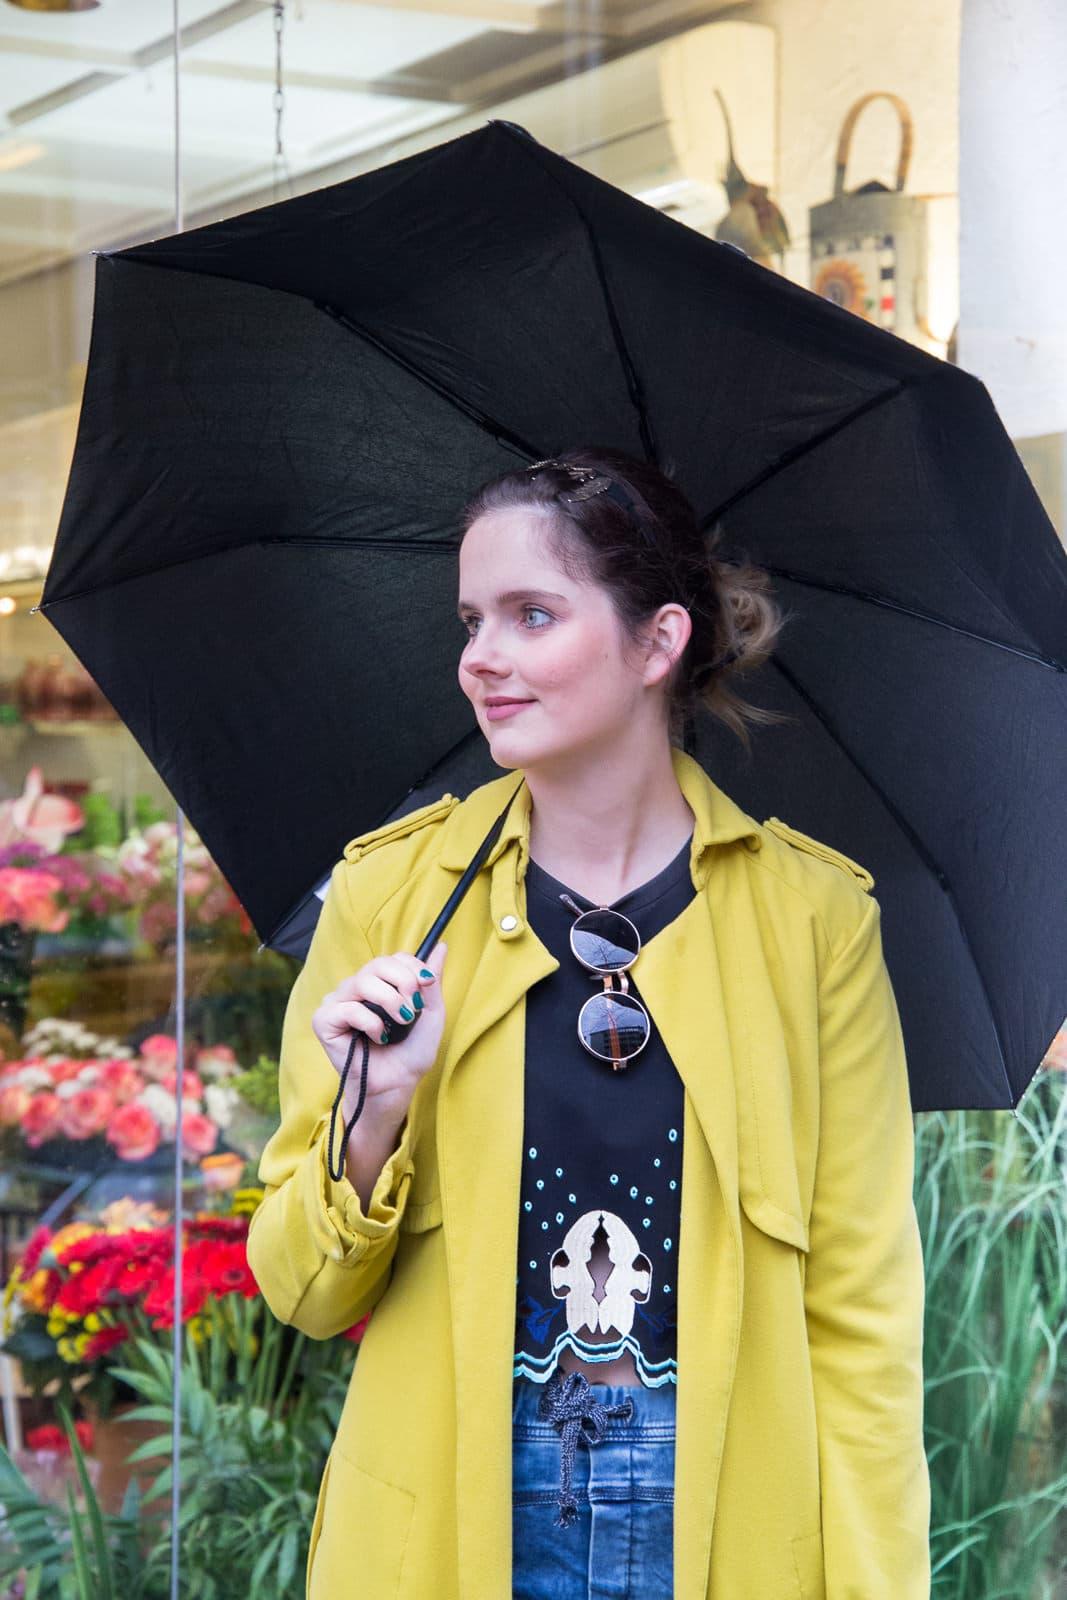 Frühlingshaftes Outfit trotz Aprilwetter: Gant Sneakers mit Flowerprint